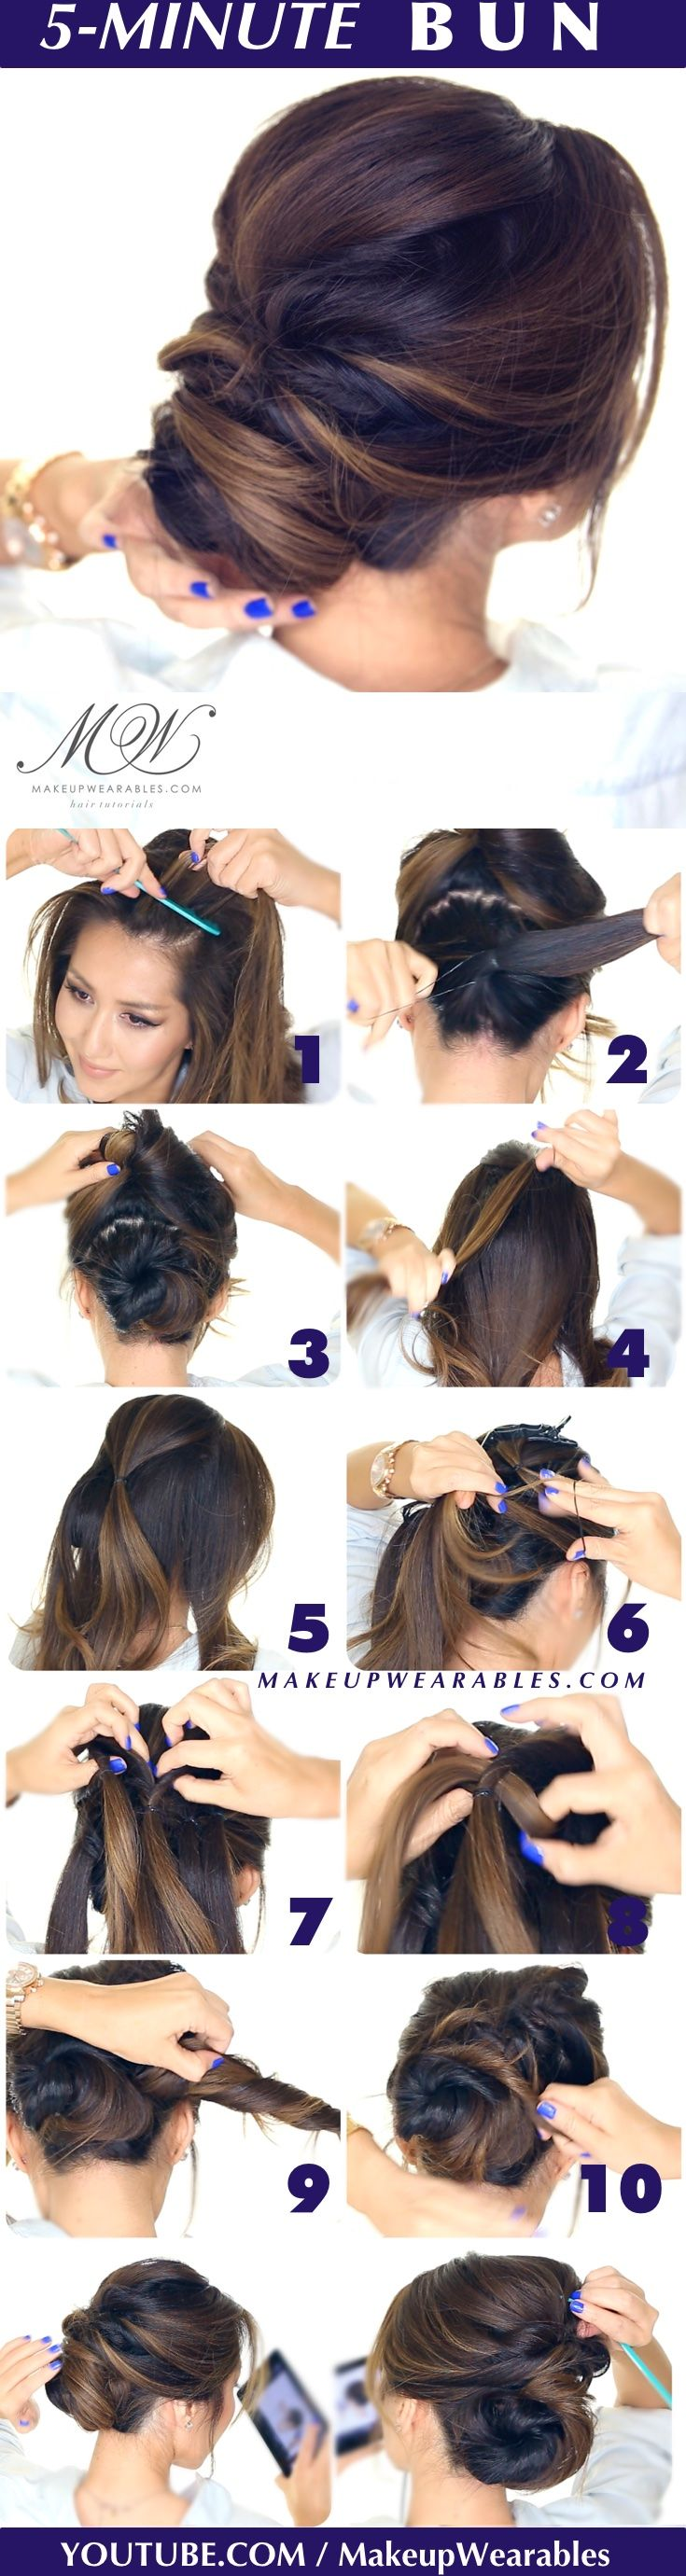 Pleasing Buns Elegant Bun And Bun Hairstyles On Pinterest Short Hairstyles For Black Women Fulllsitofus